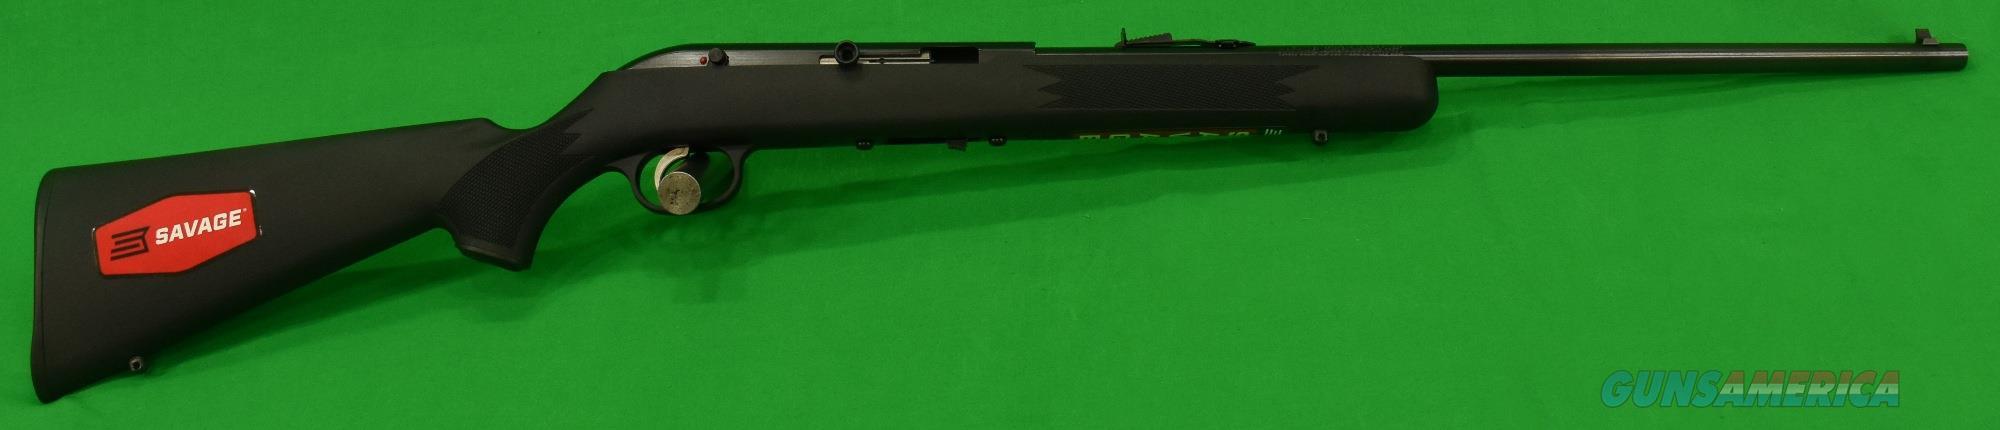 64 FXP Black Syn Scoped 22LR 21In 40000  Guns > Rifles > Savage Rifles > Other